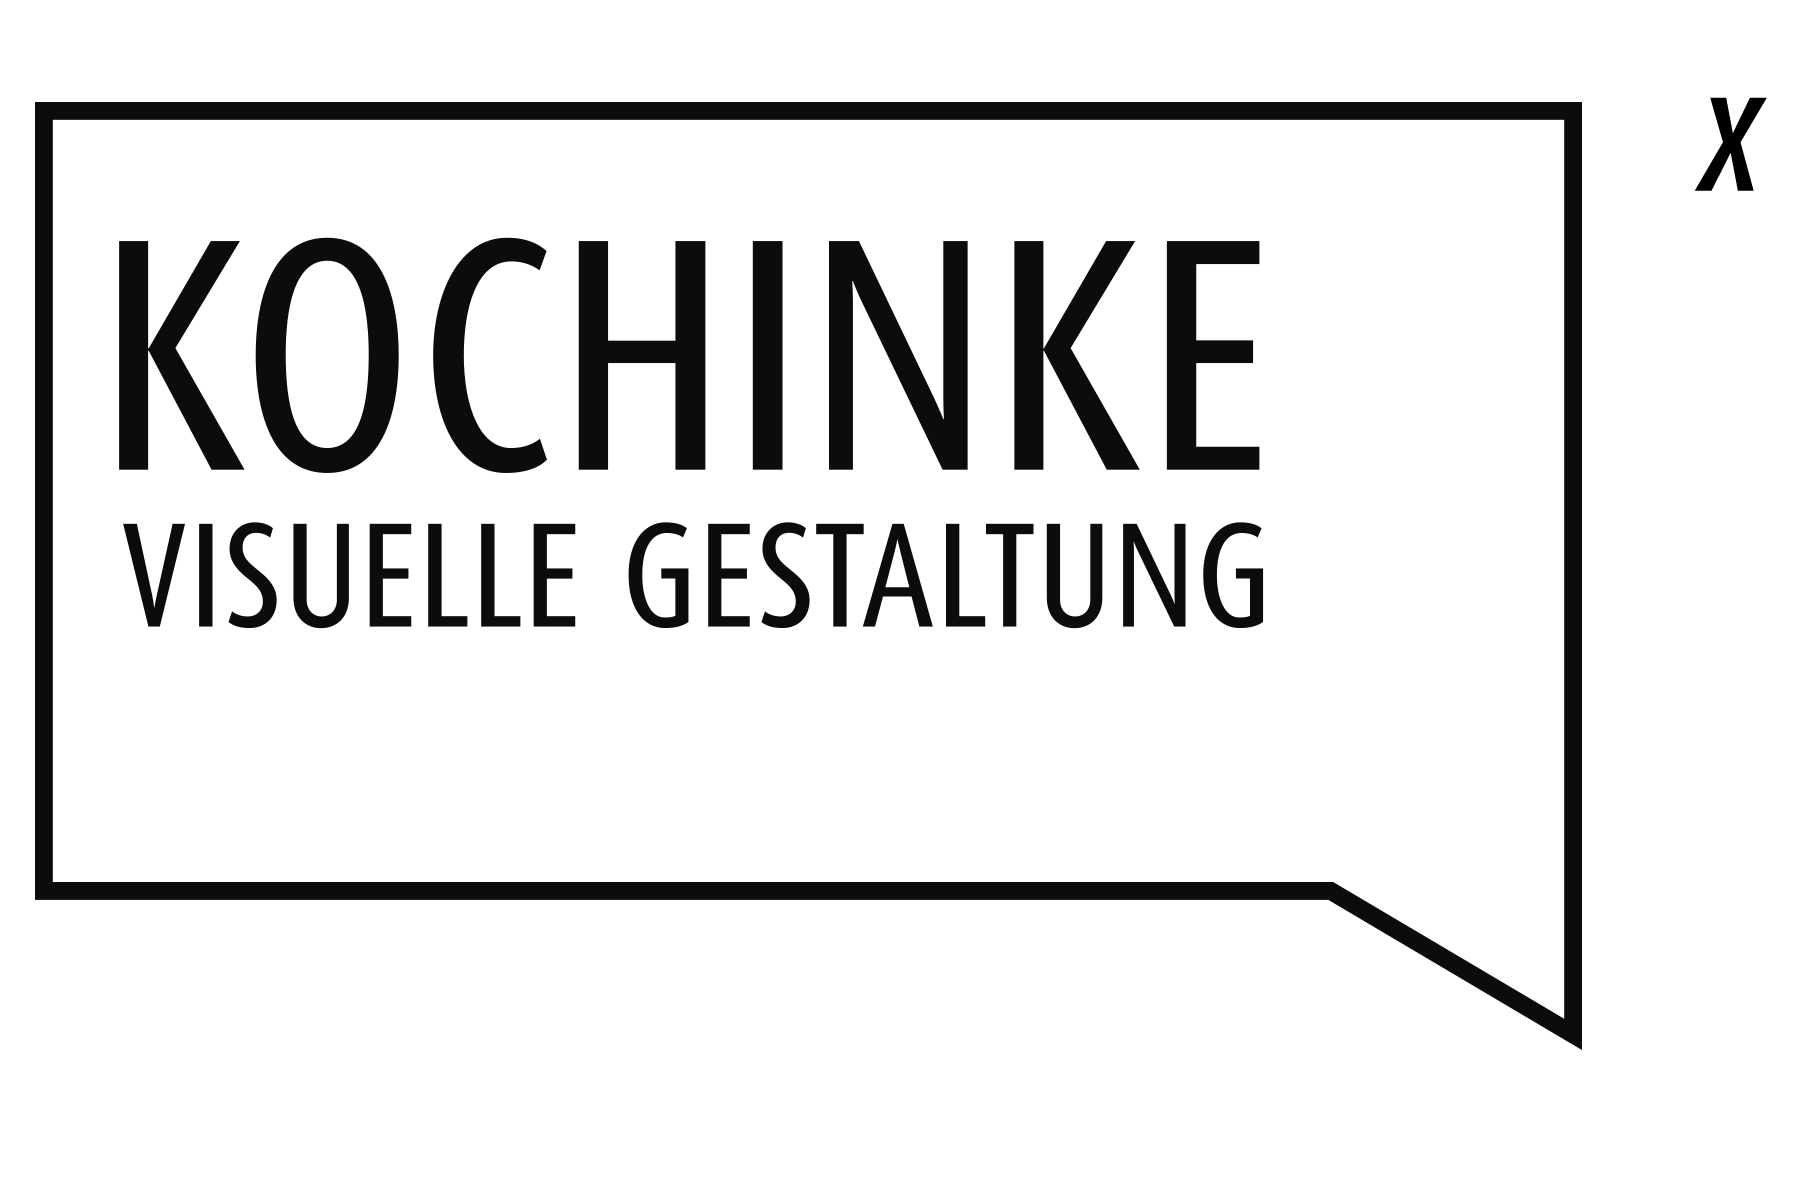 KOCHINKE | VISUELLE GESTALTUNG